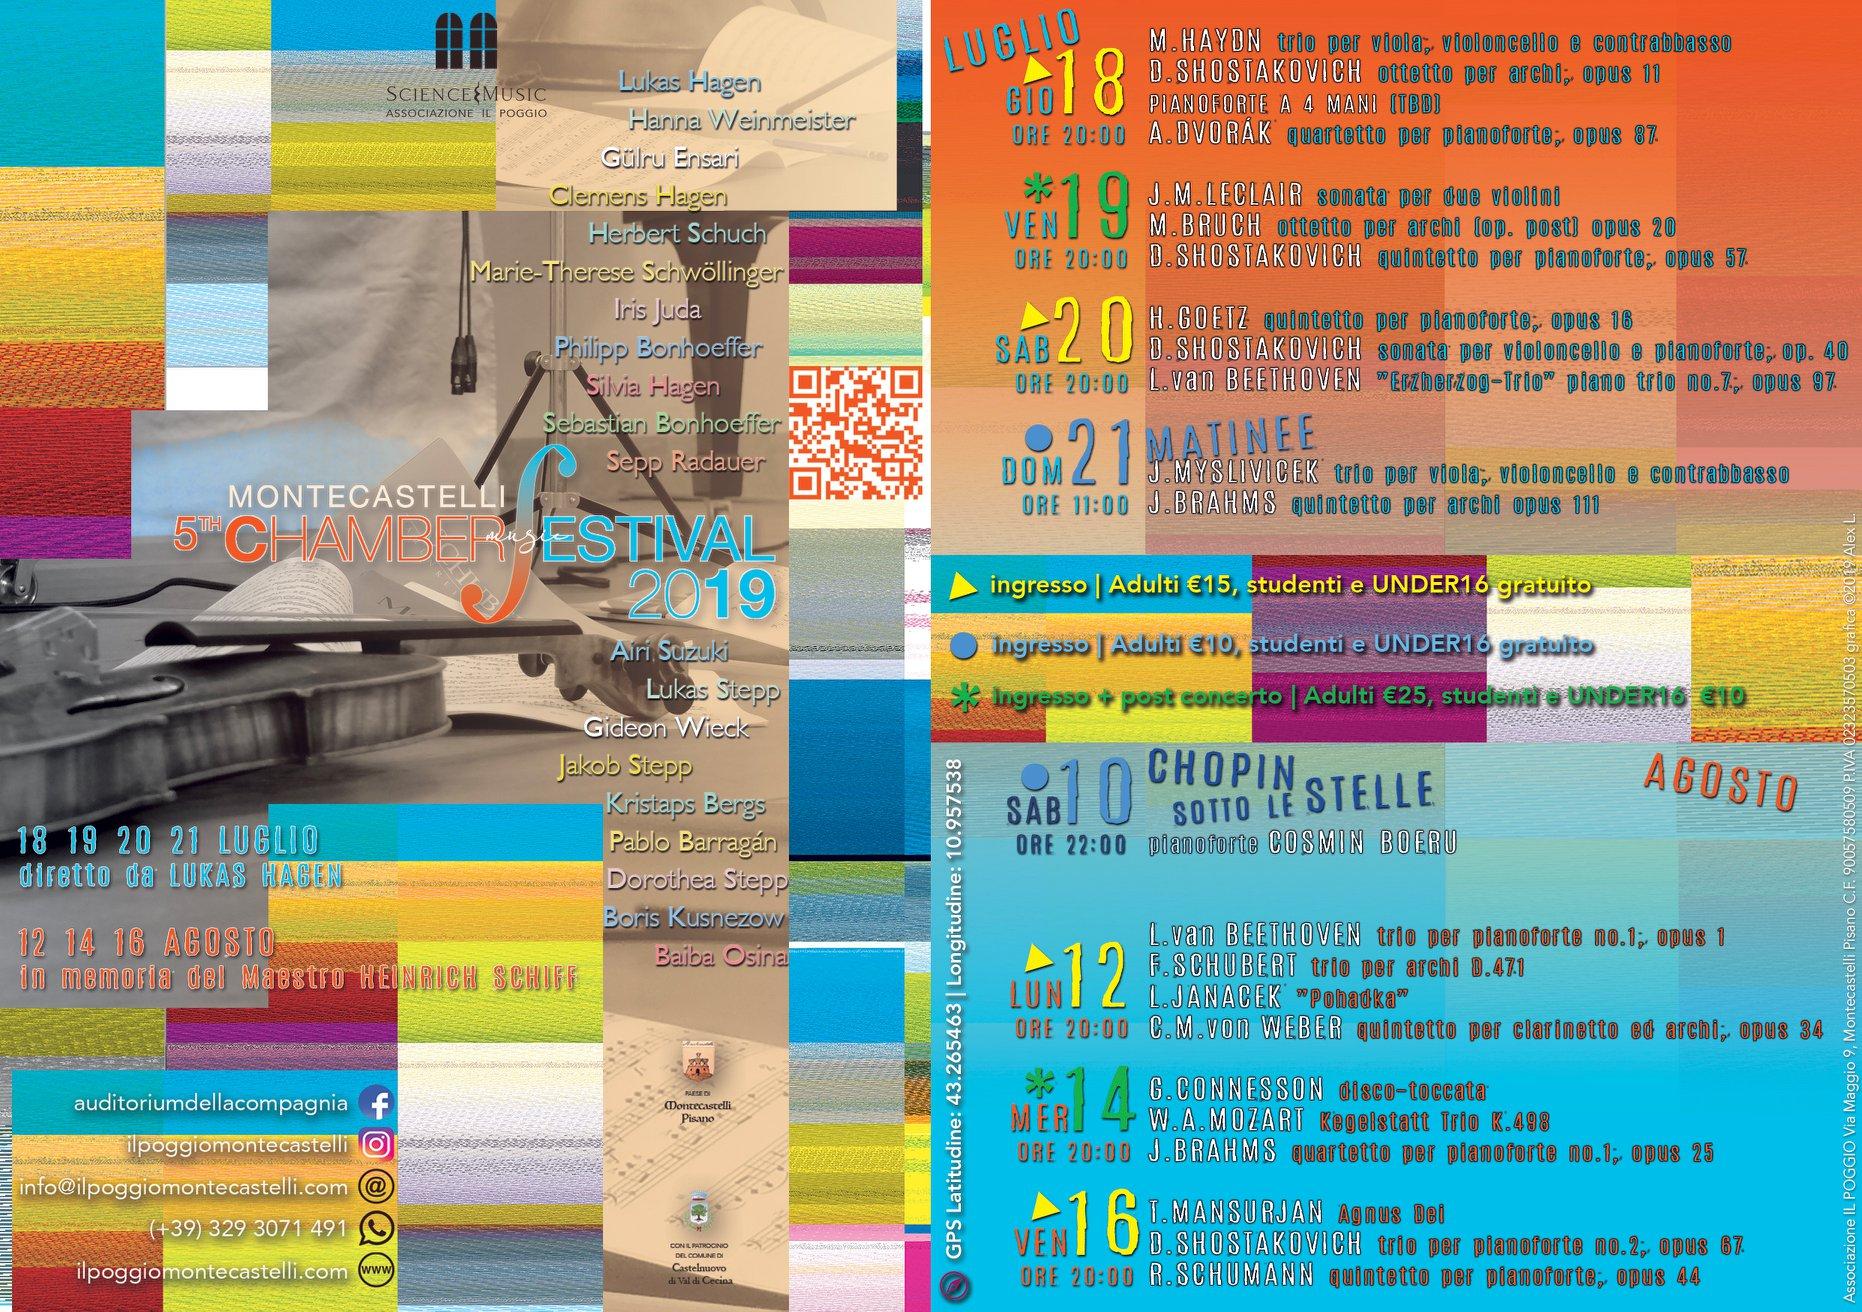 5° Montecastelli Chamber Festival – sessione agosto